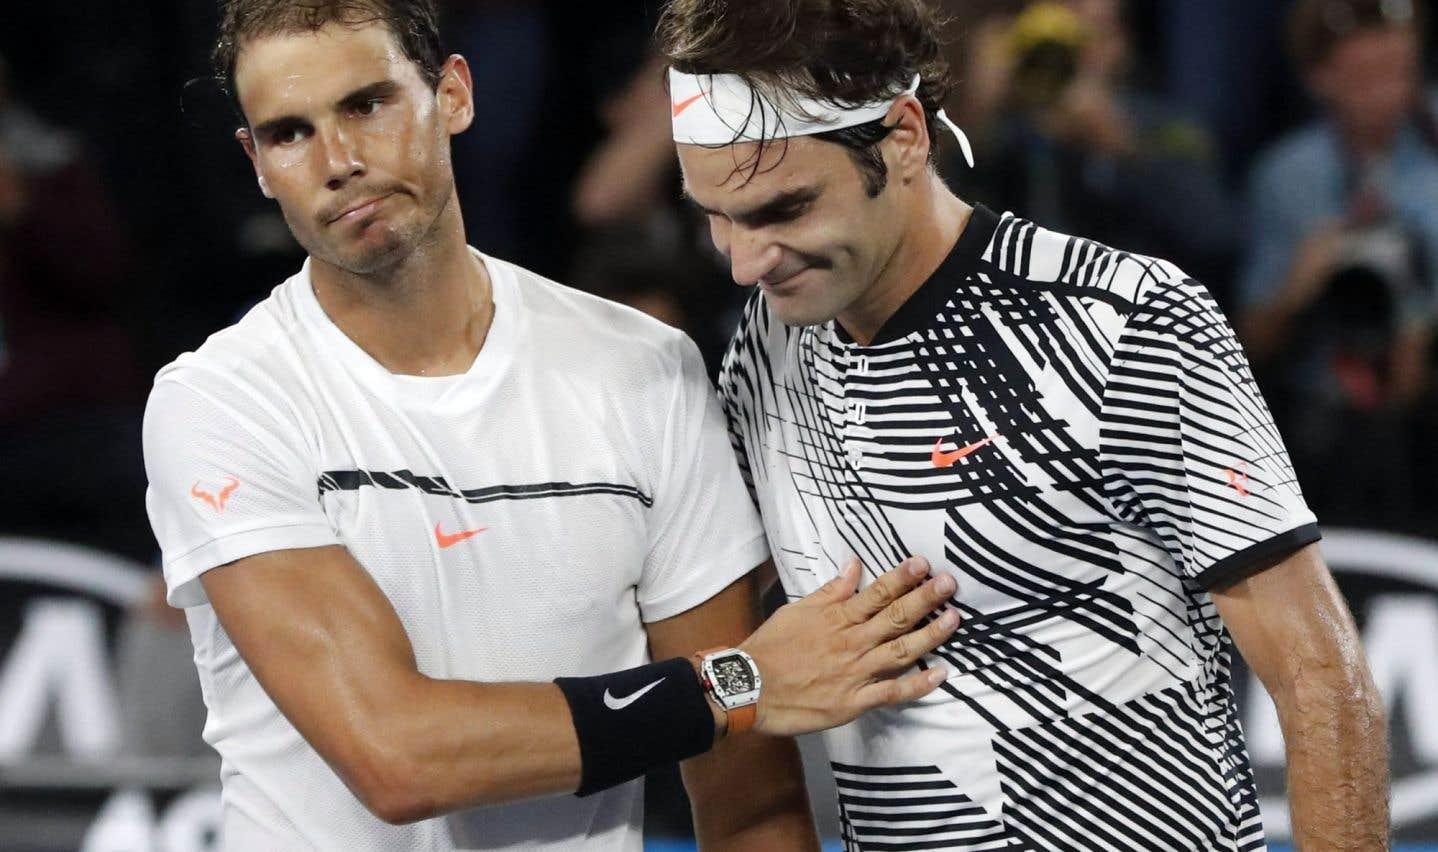 Nadal et Federer de retour au sommet du tennis masculin